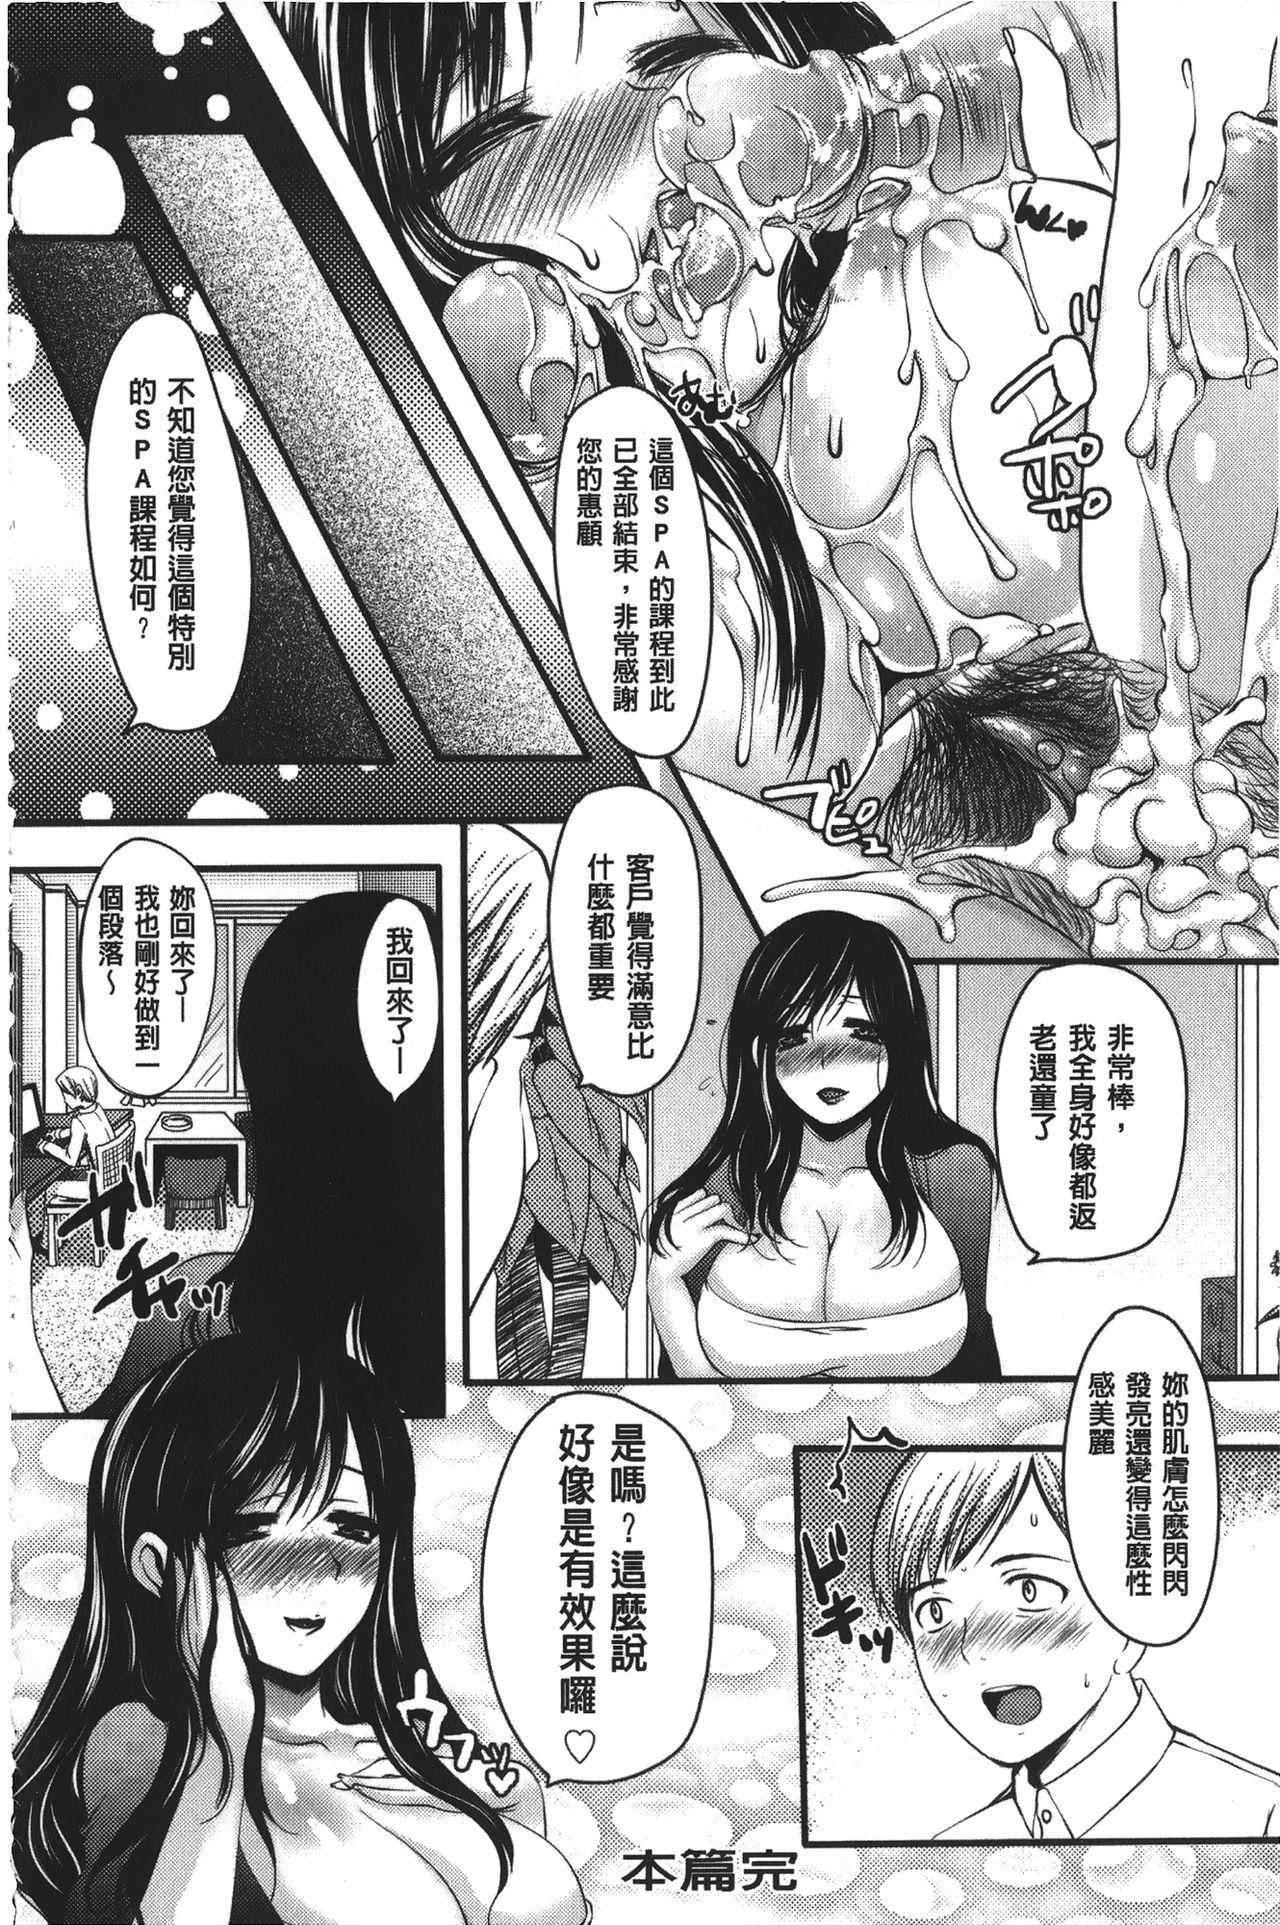 Kanjuku Torozuma 149